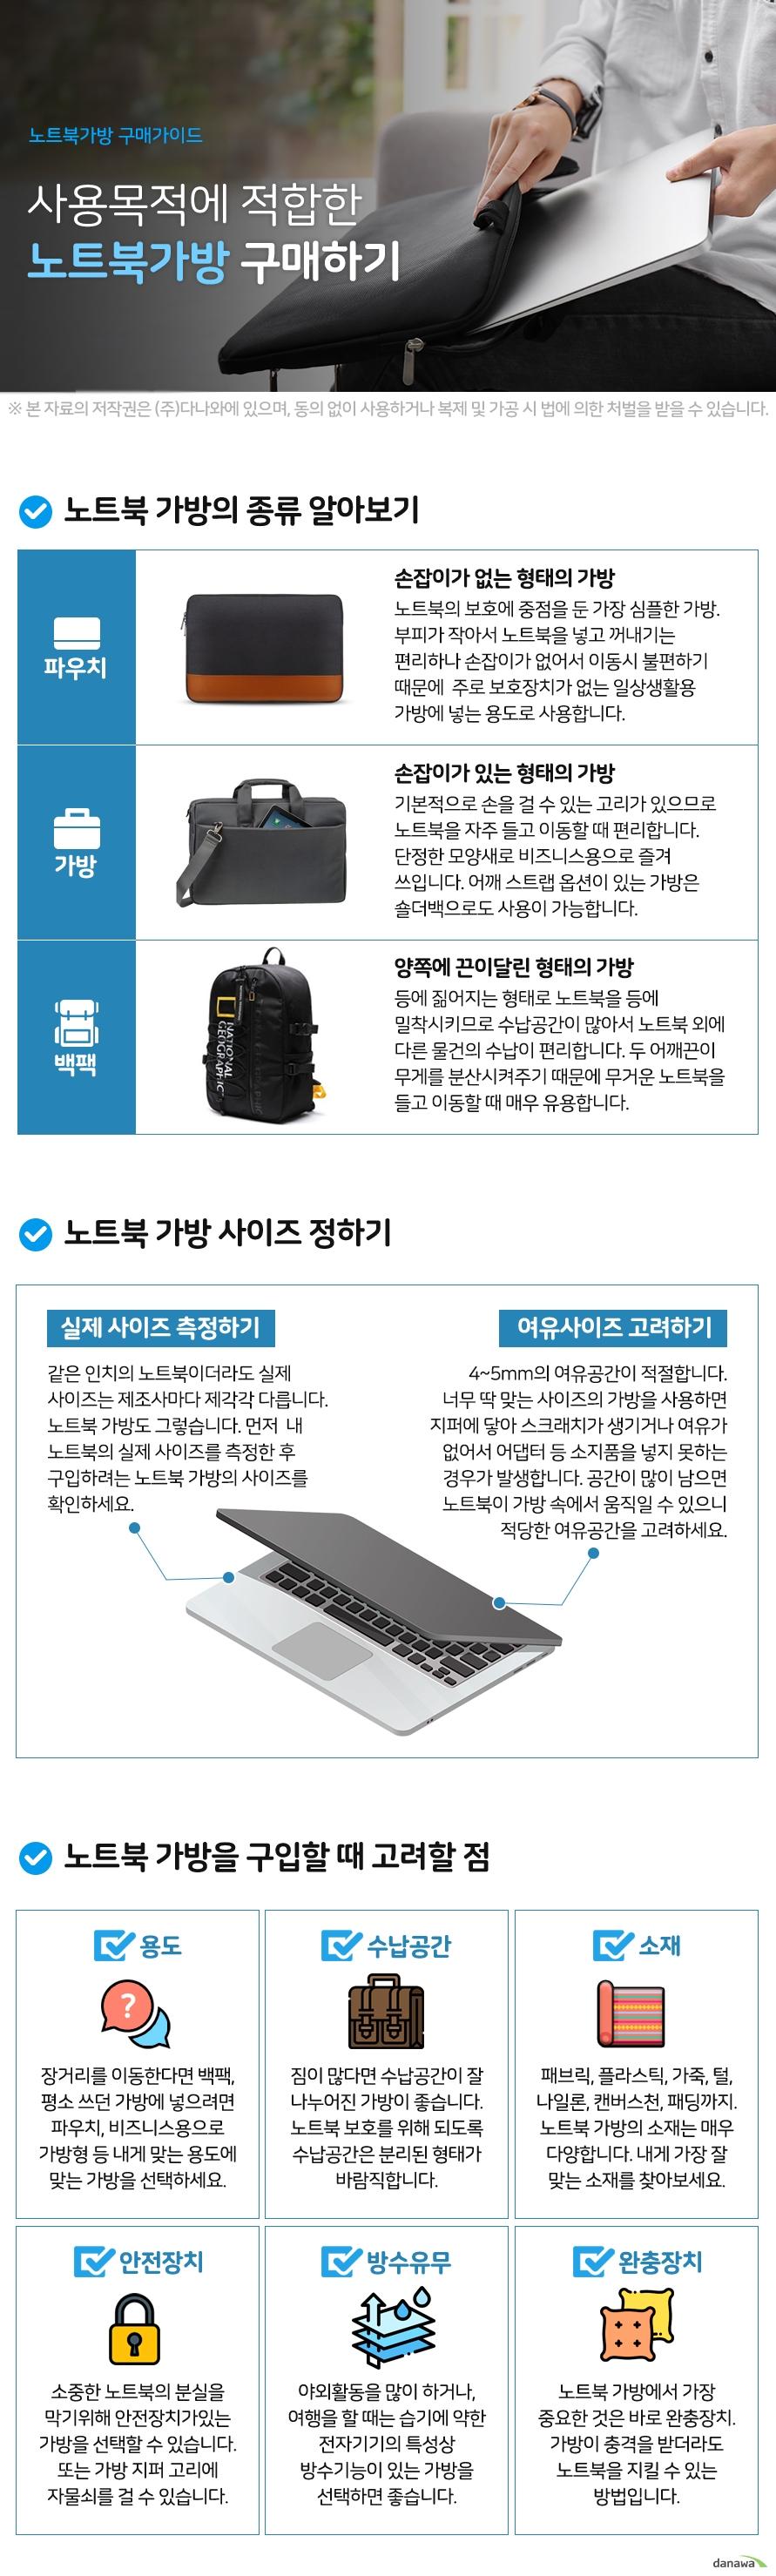 DAMONCOM DAMONCOM 노트북 맥북 파우치 15.6형 NT-395 (블랙)